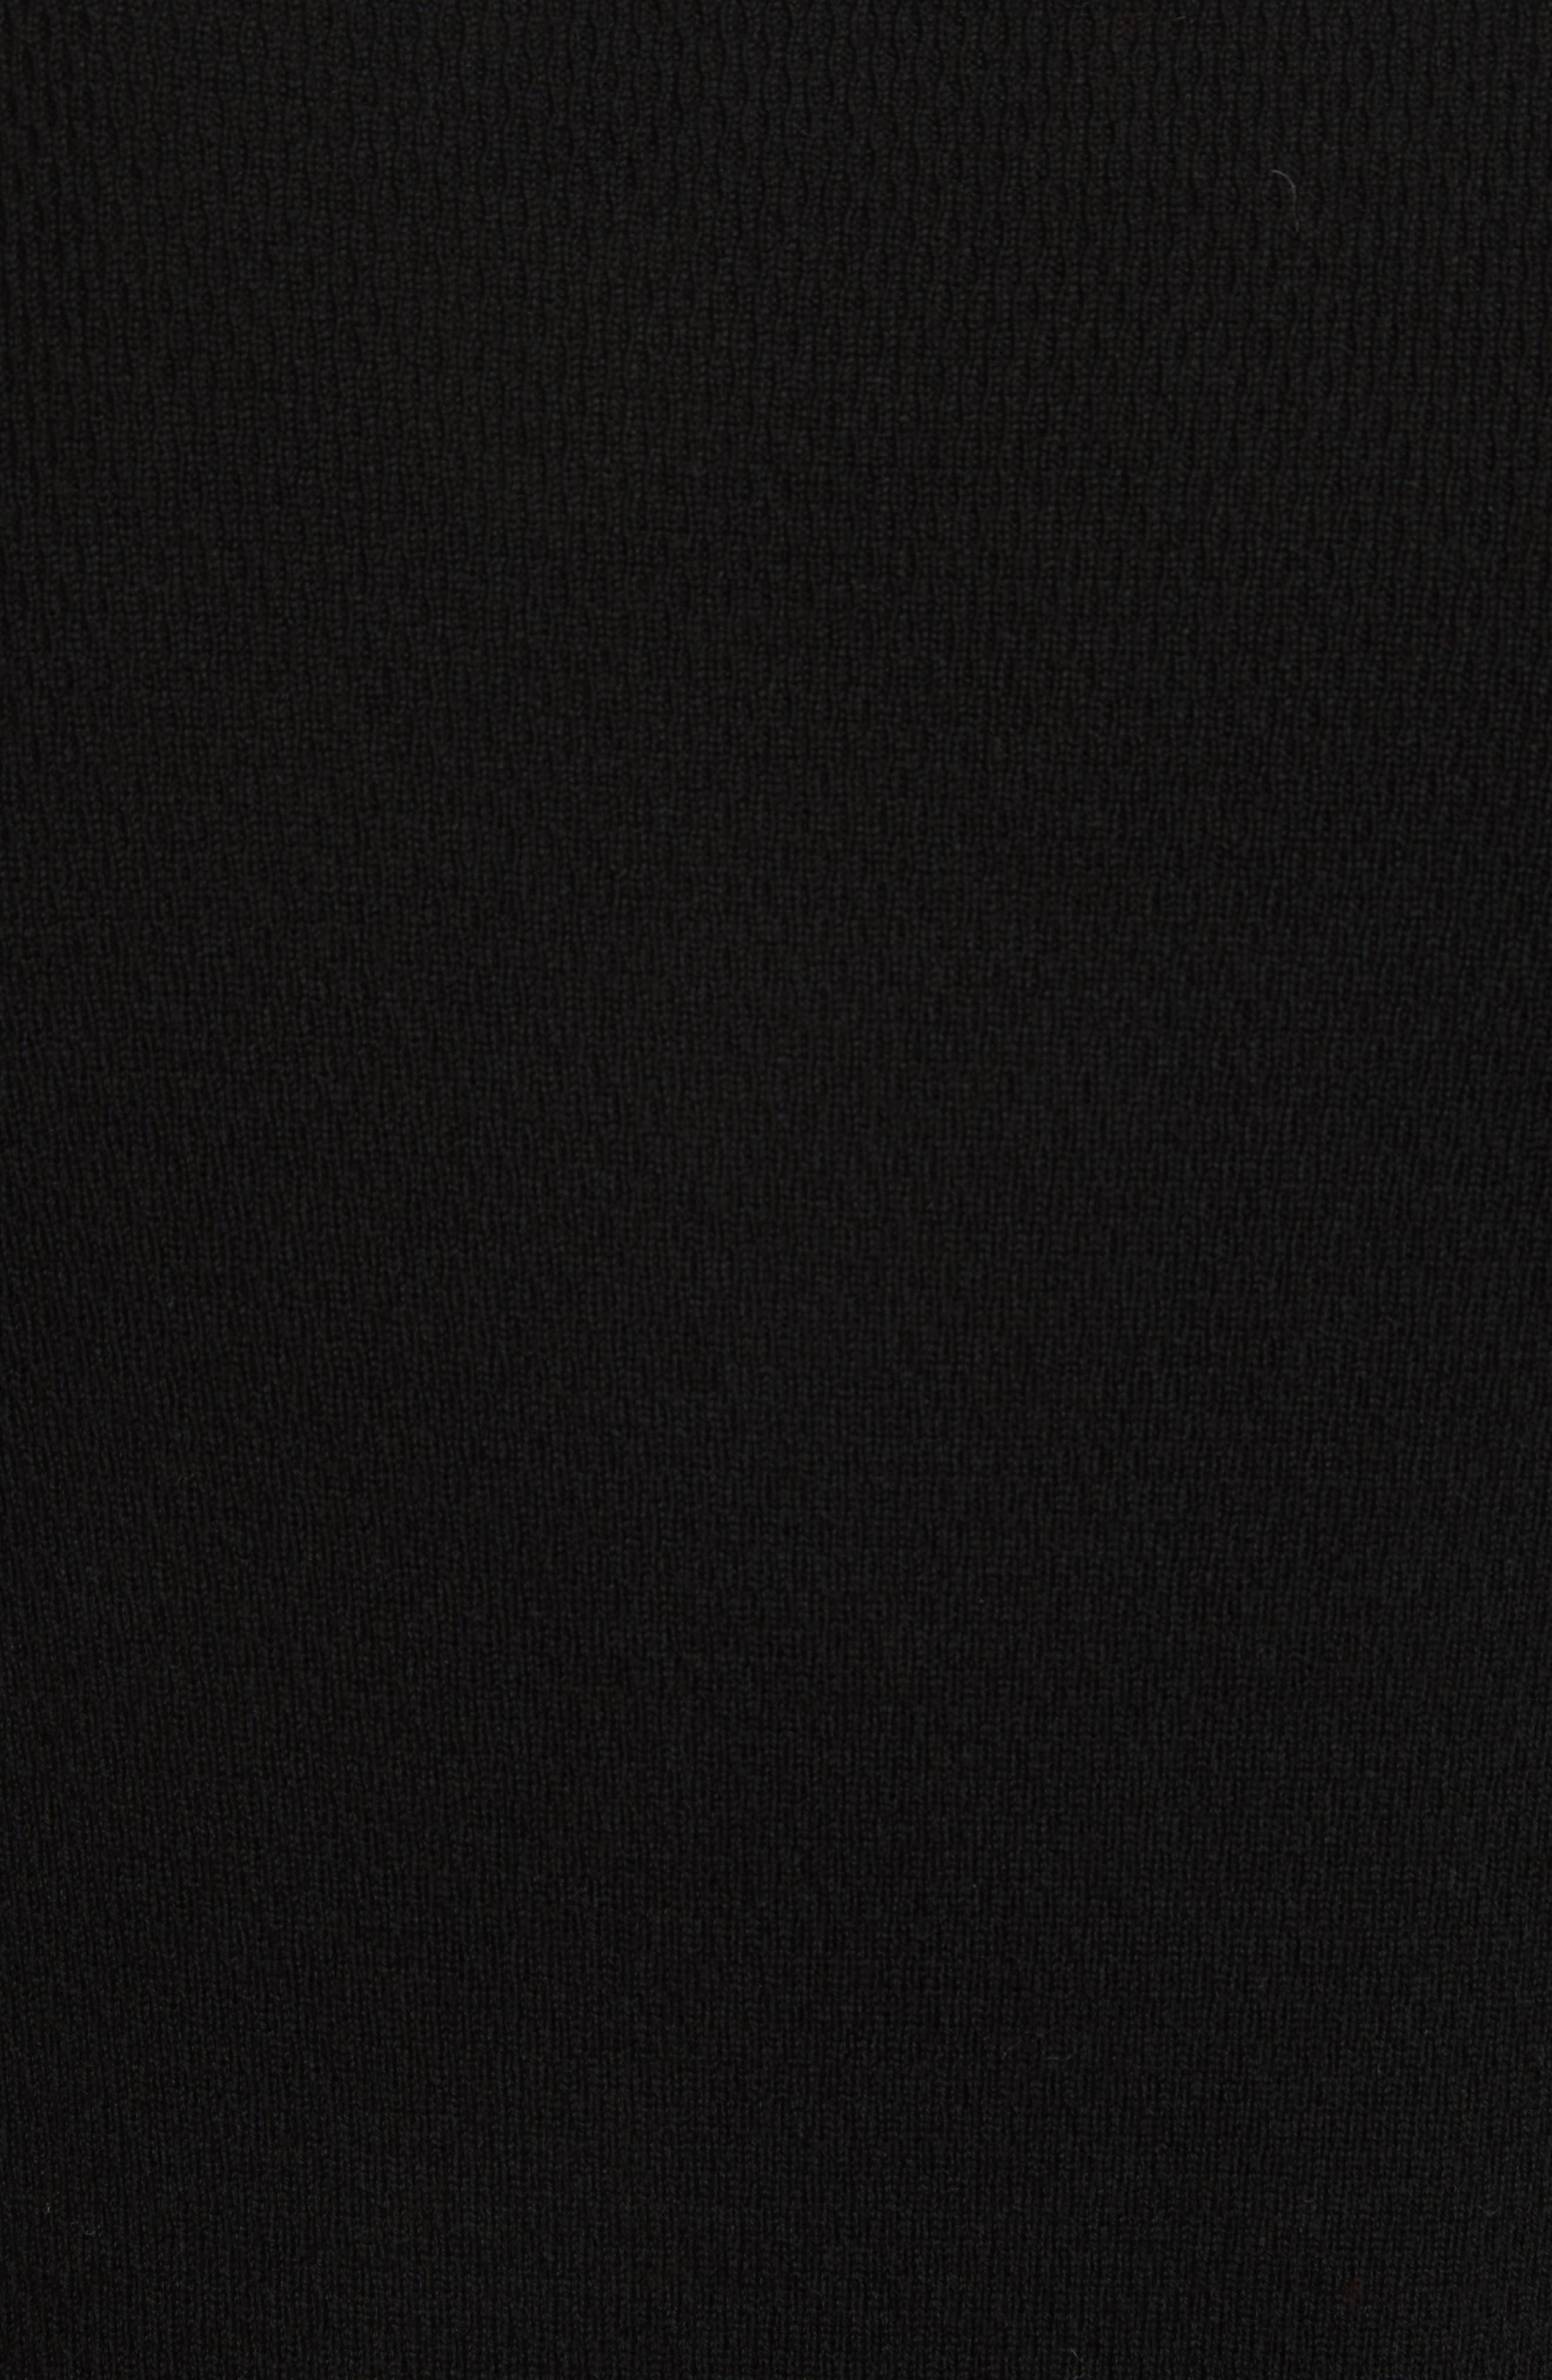 Gregory Crewneck Sweater,                             Alternate thumbnail 5, color,                             001